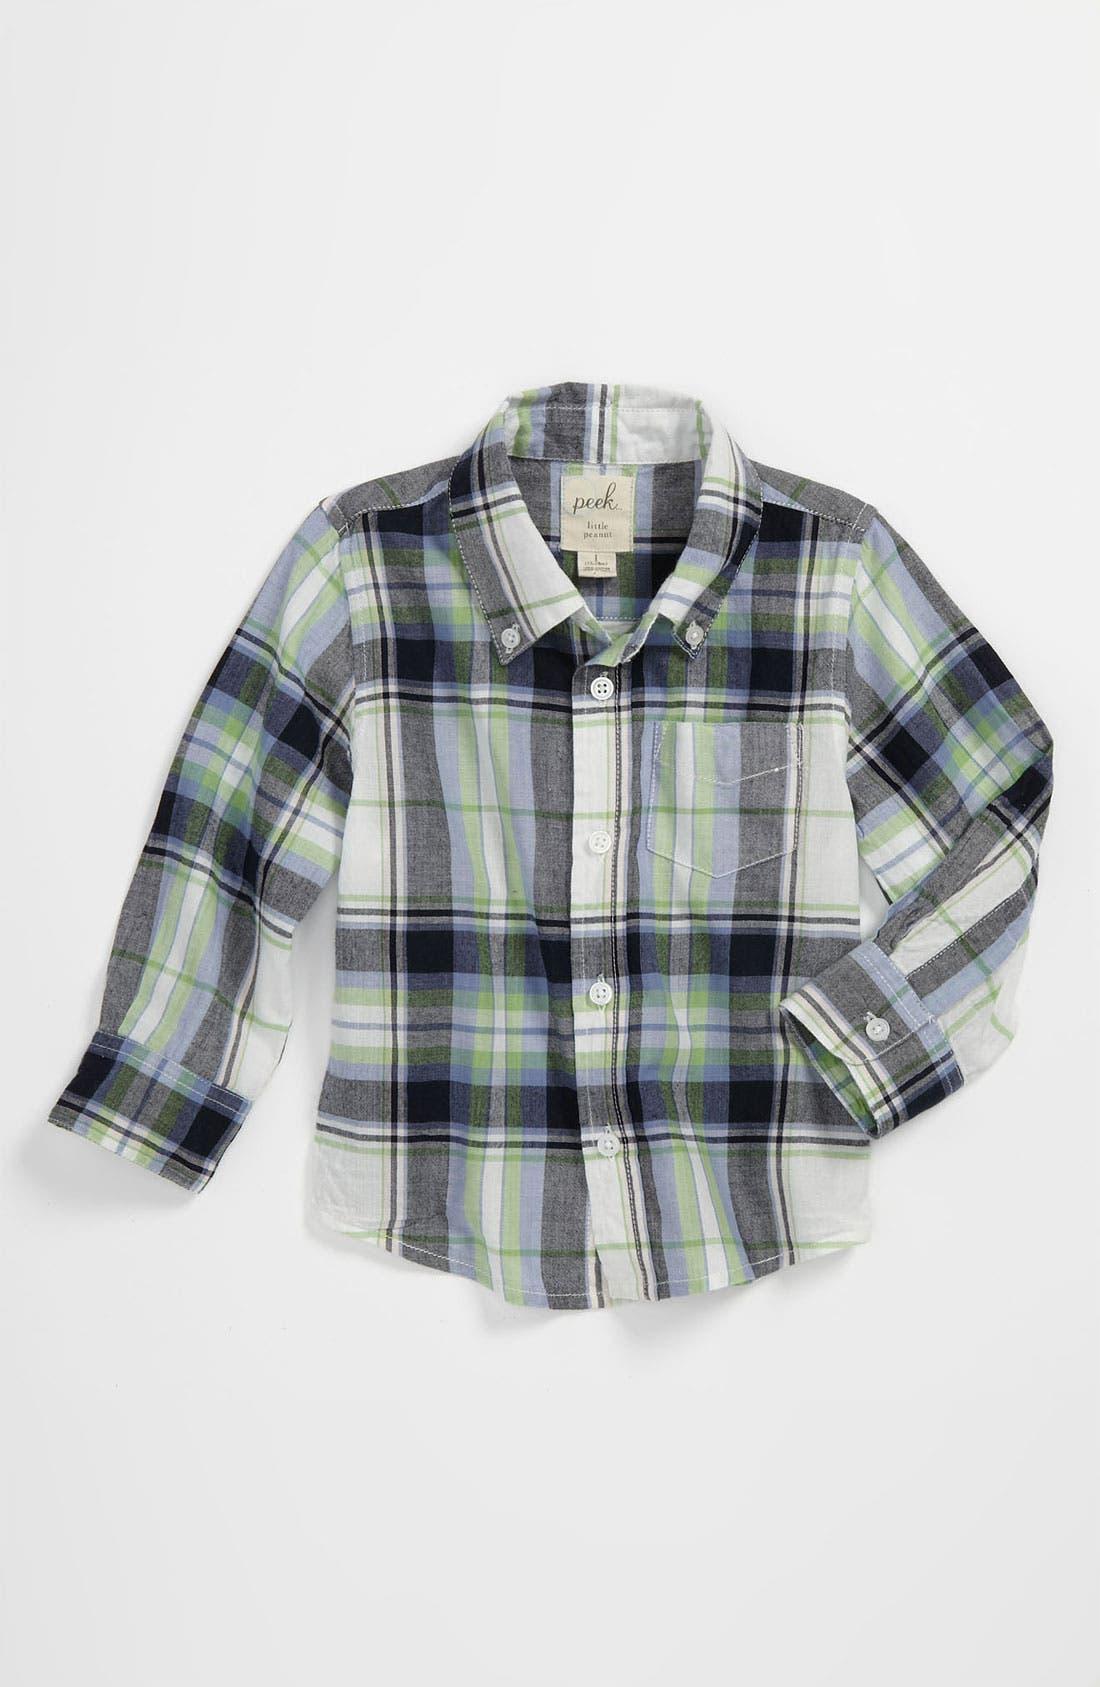 Main Image - Peek 'Easter Plaid' Shirt (Baby)